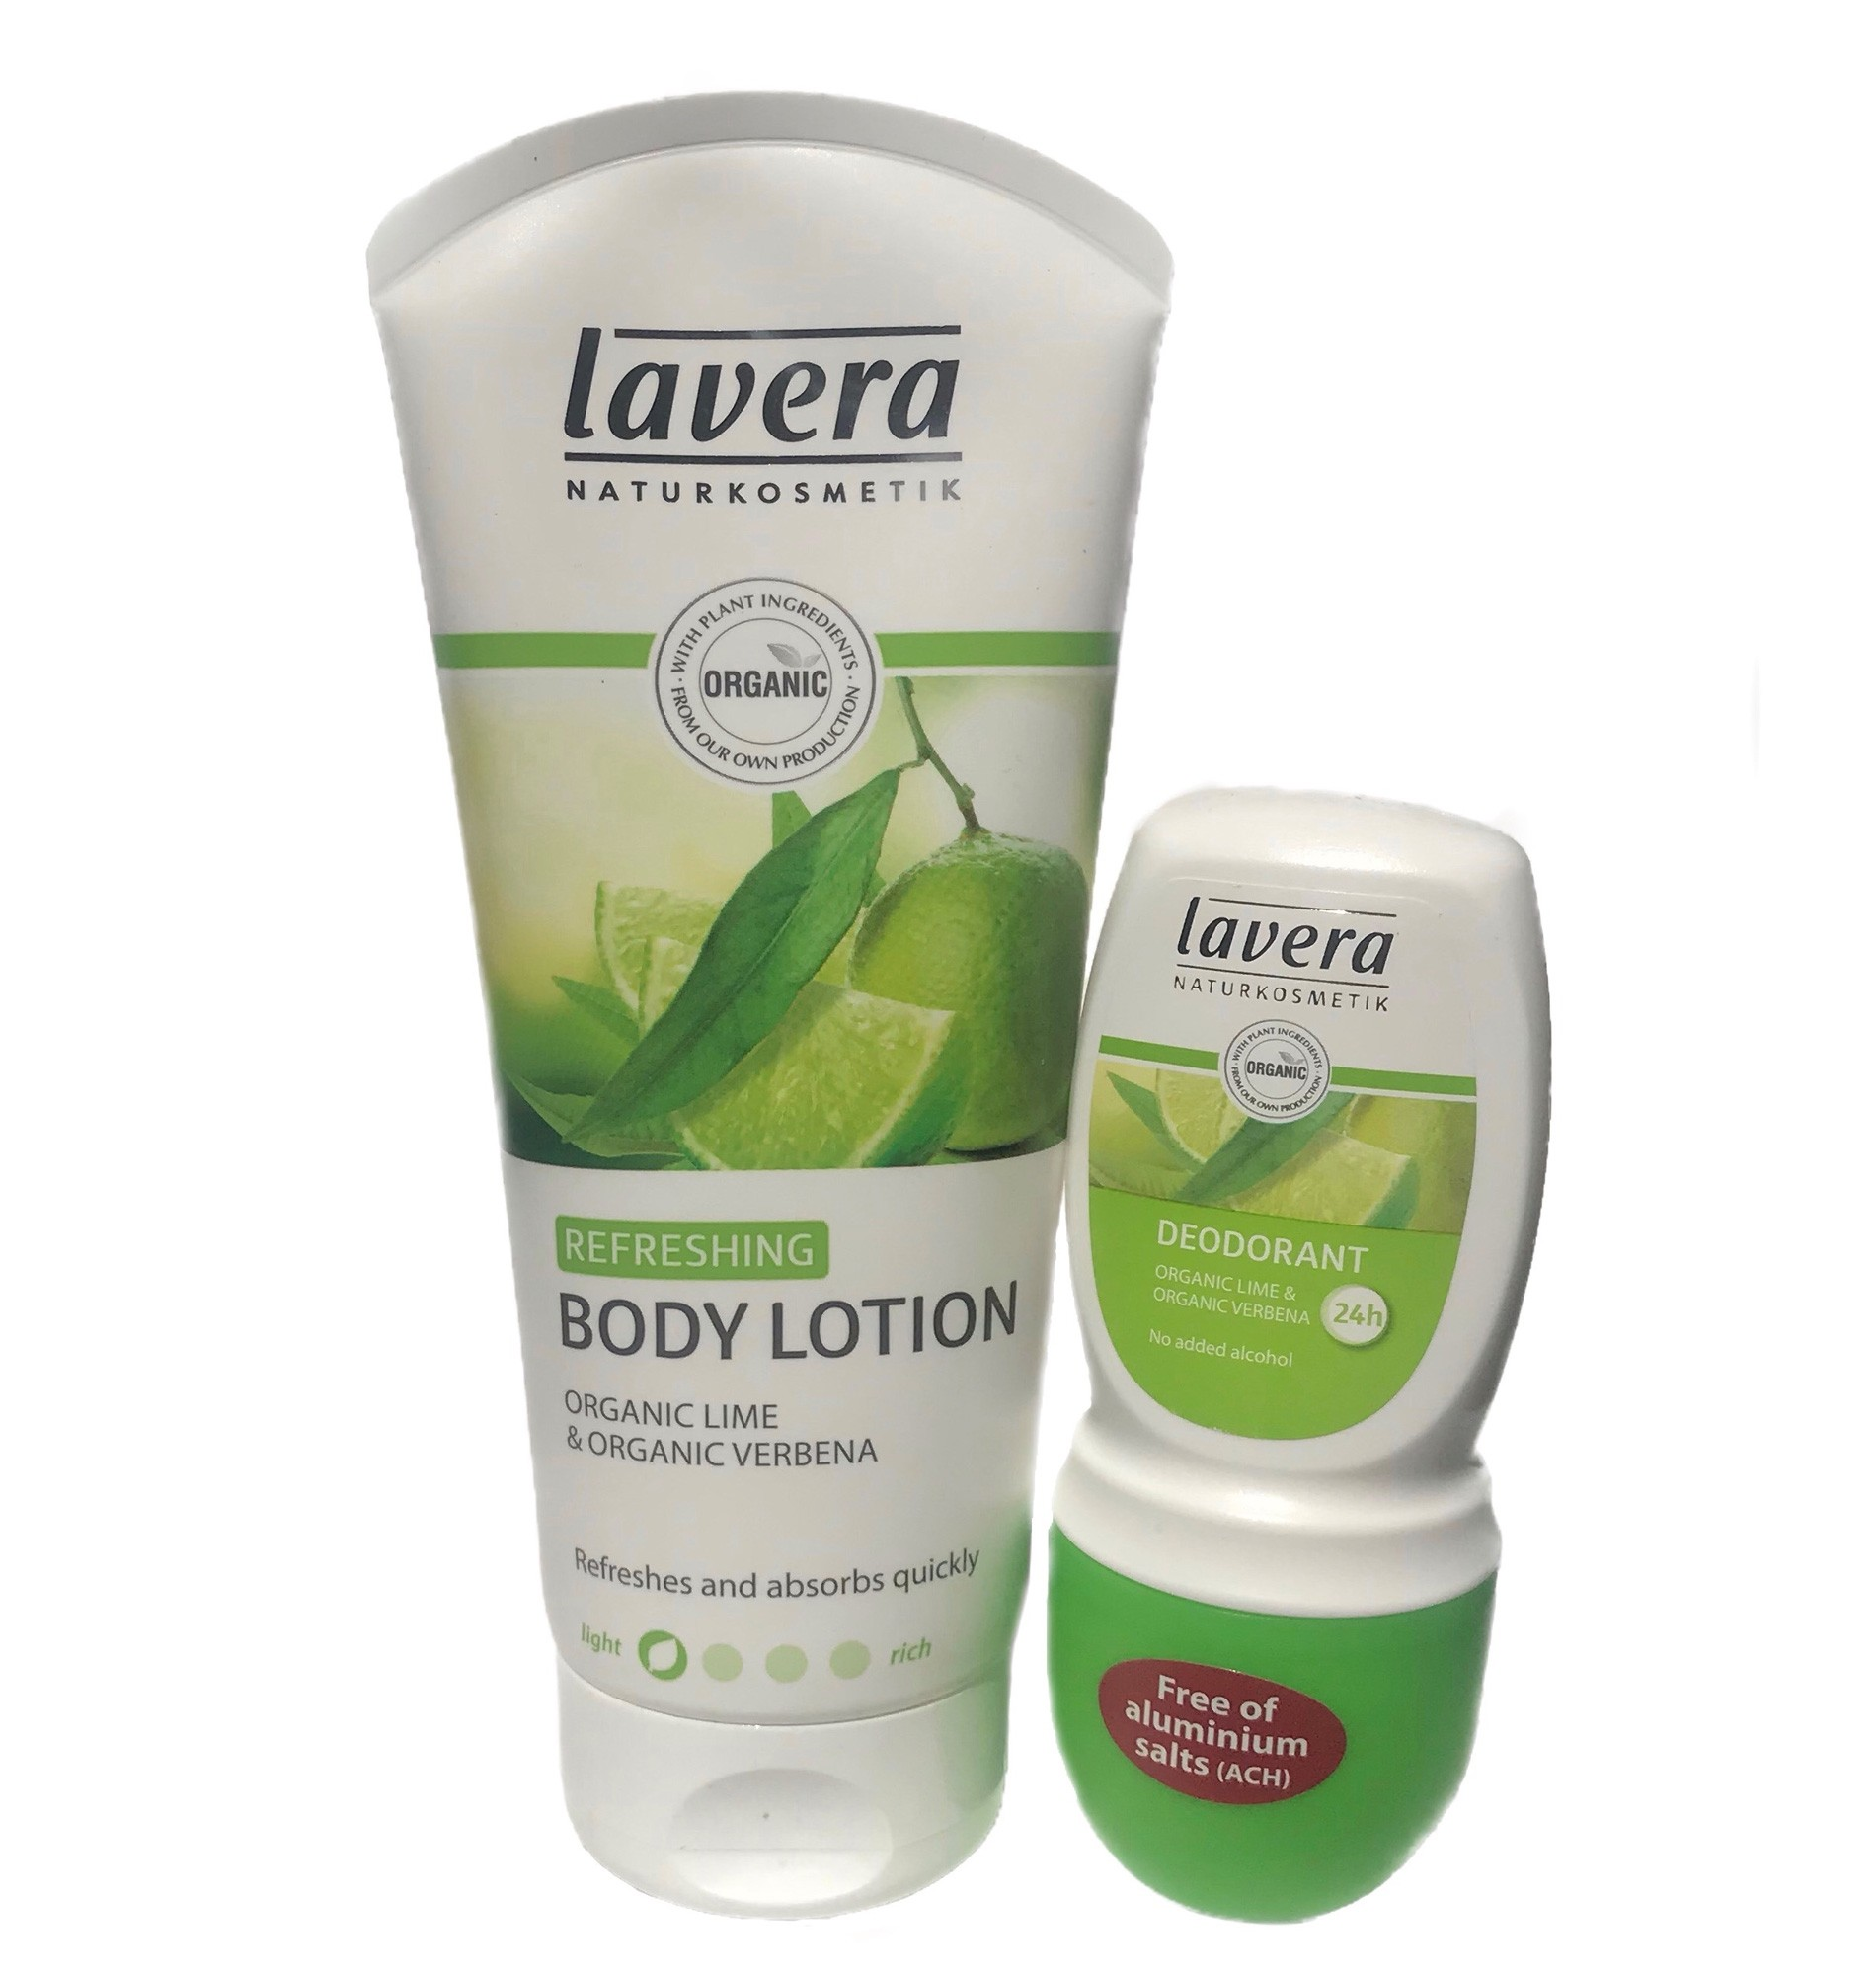 Lavera Refreshing Lime & Verbena Lotion & Deodorant